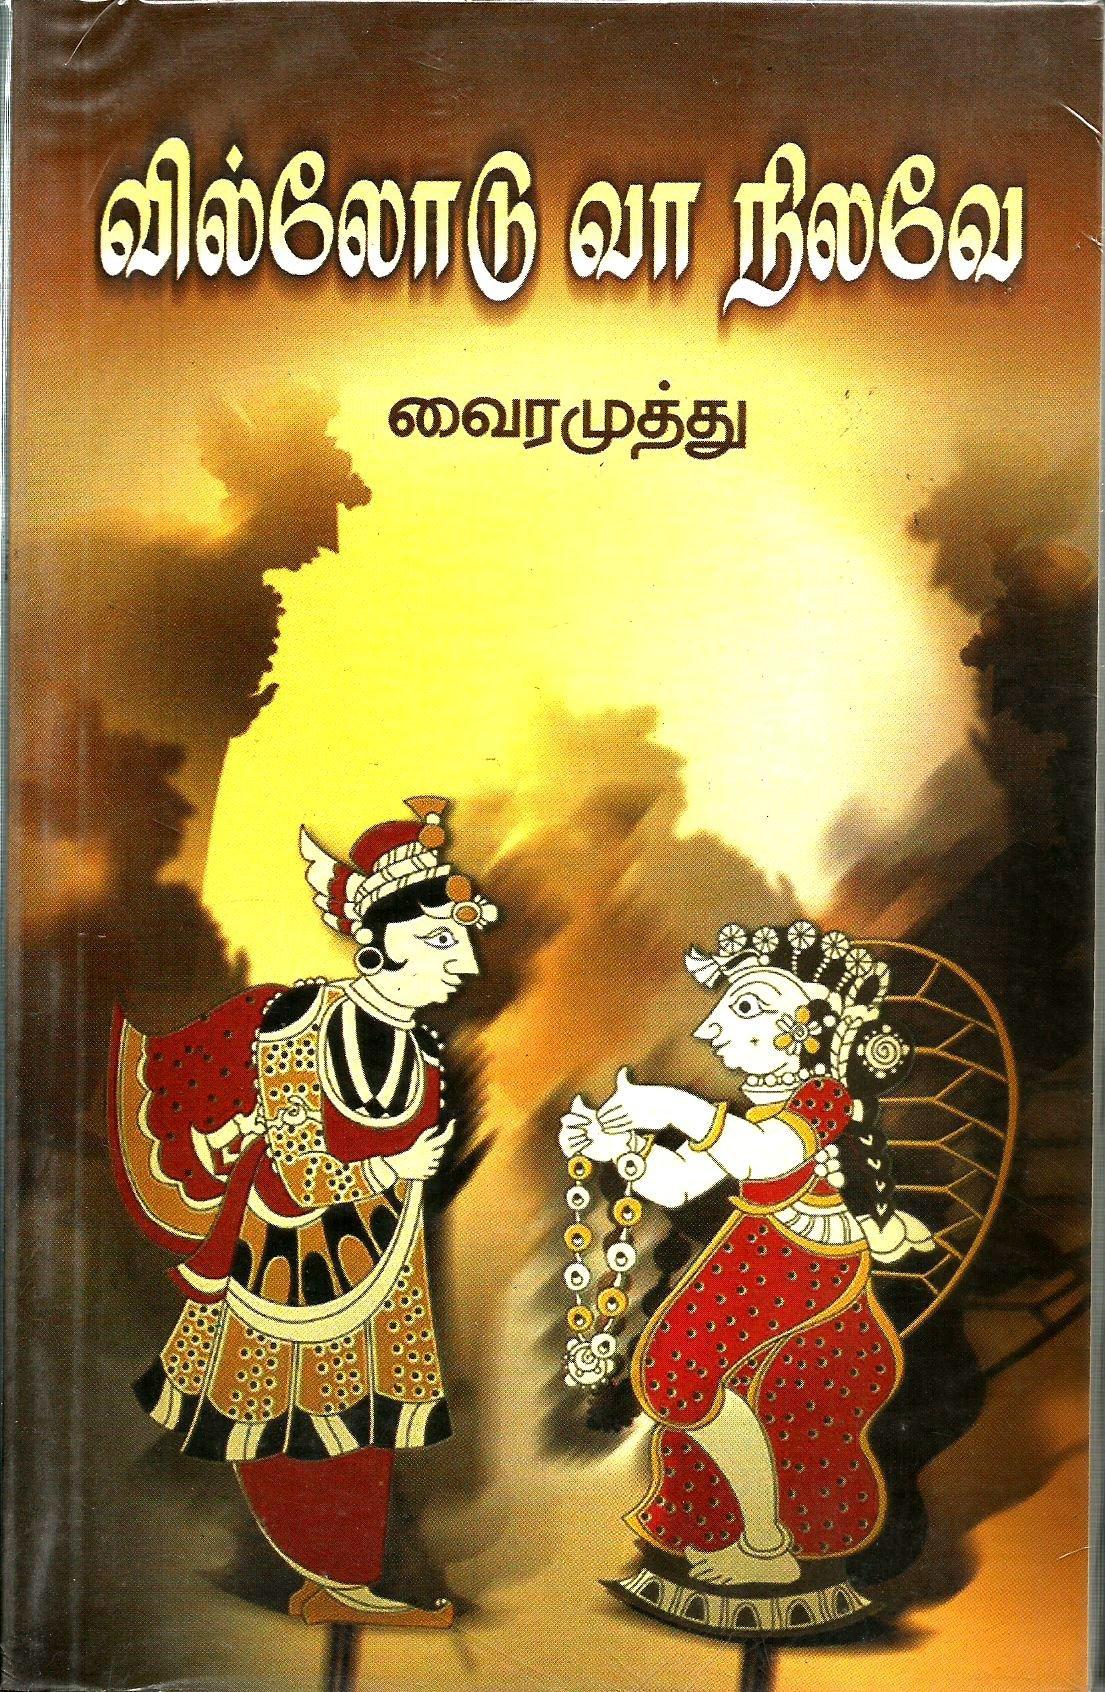 vairamuthu books villodu va nilavey